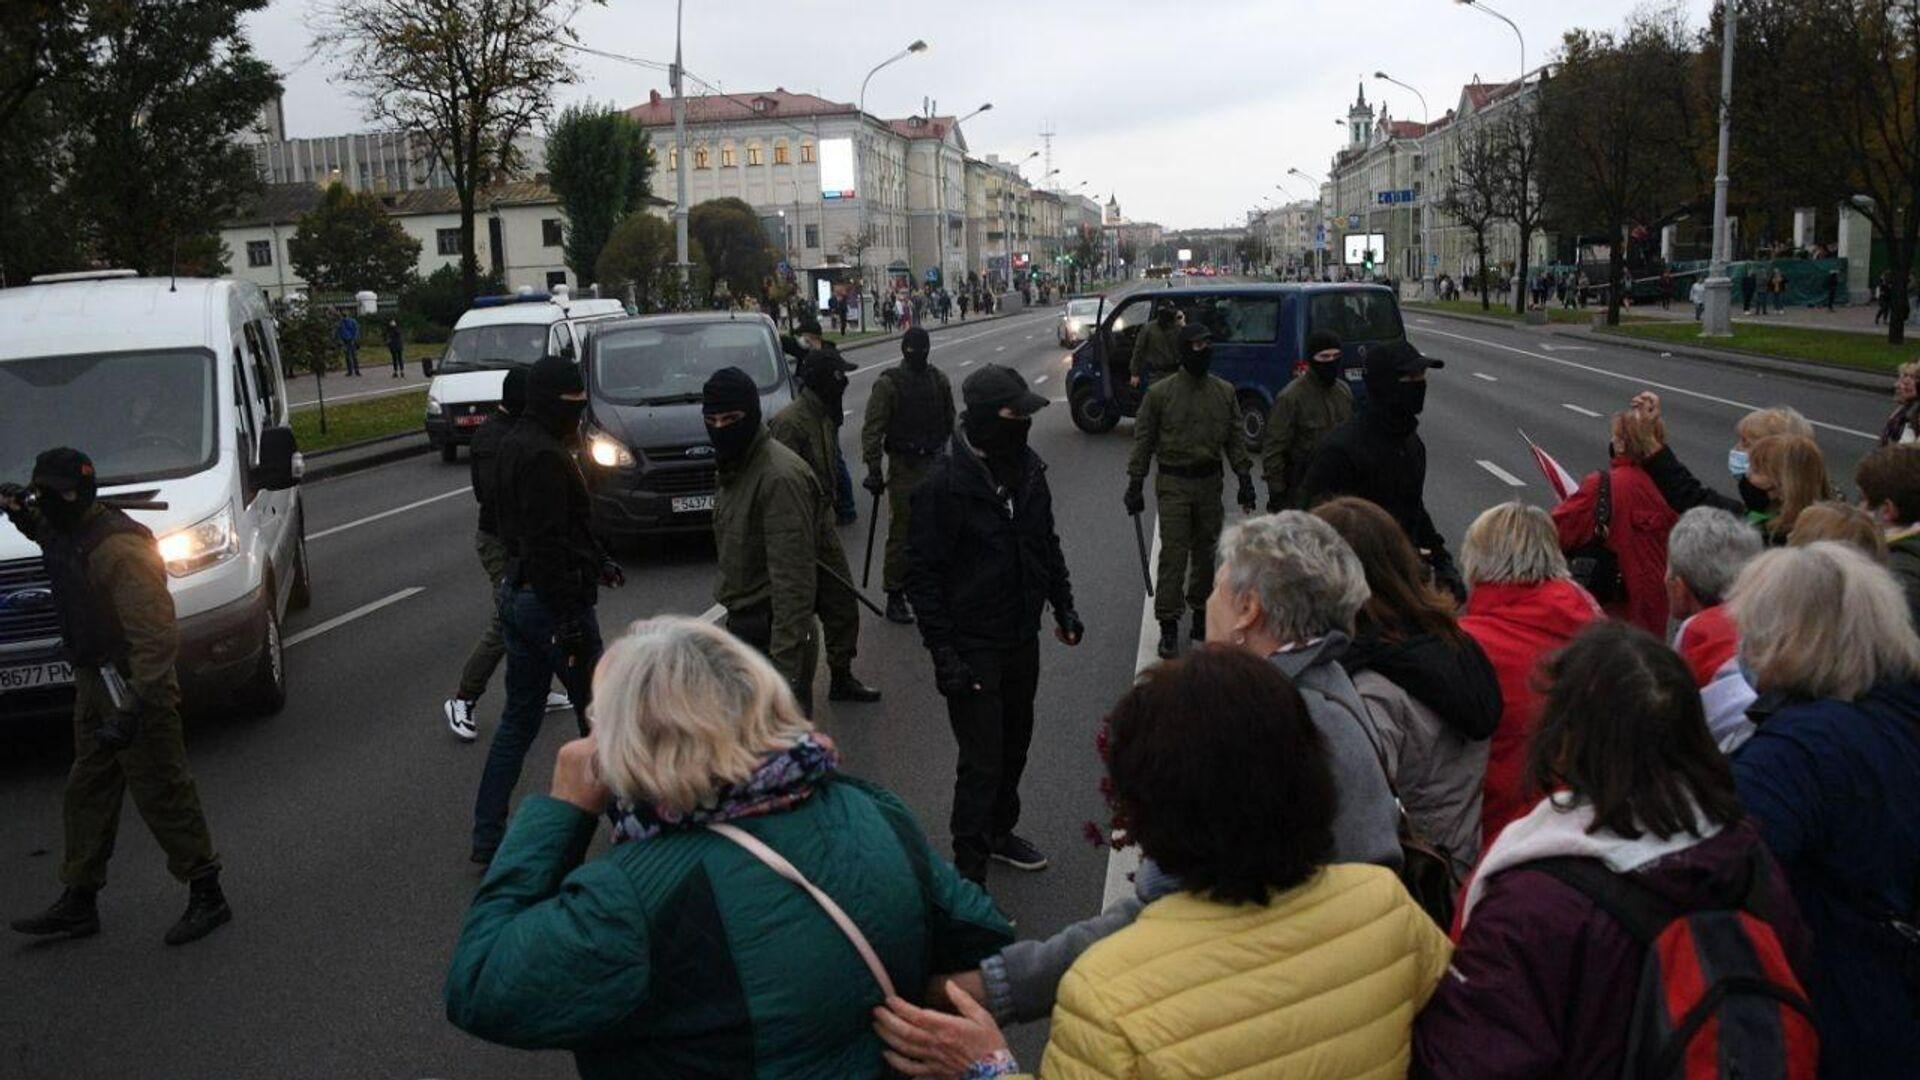 Колонна протестующих на проспекте Независимости в Минске - РИА Новости, 1920, 18.10.2020